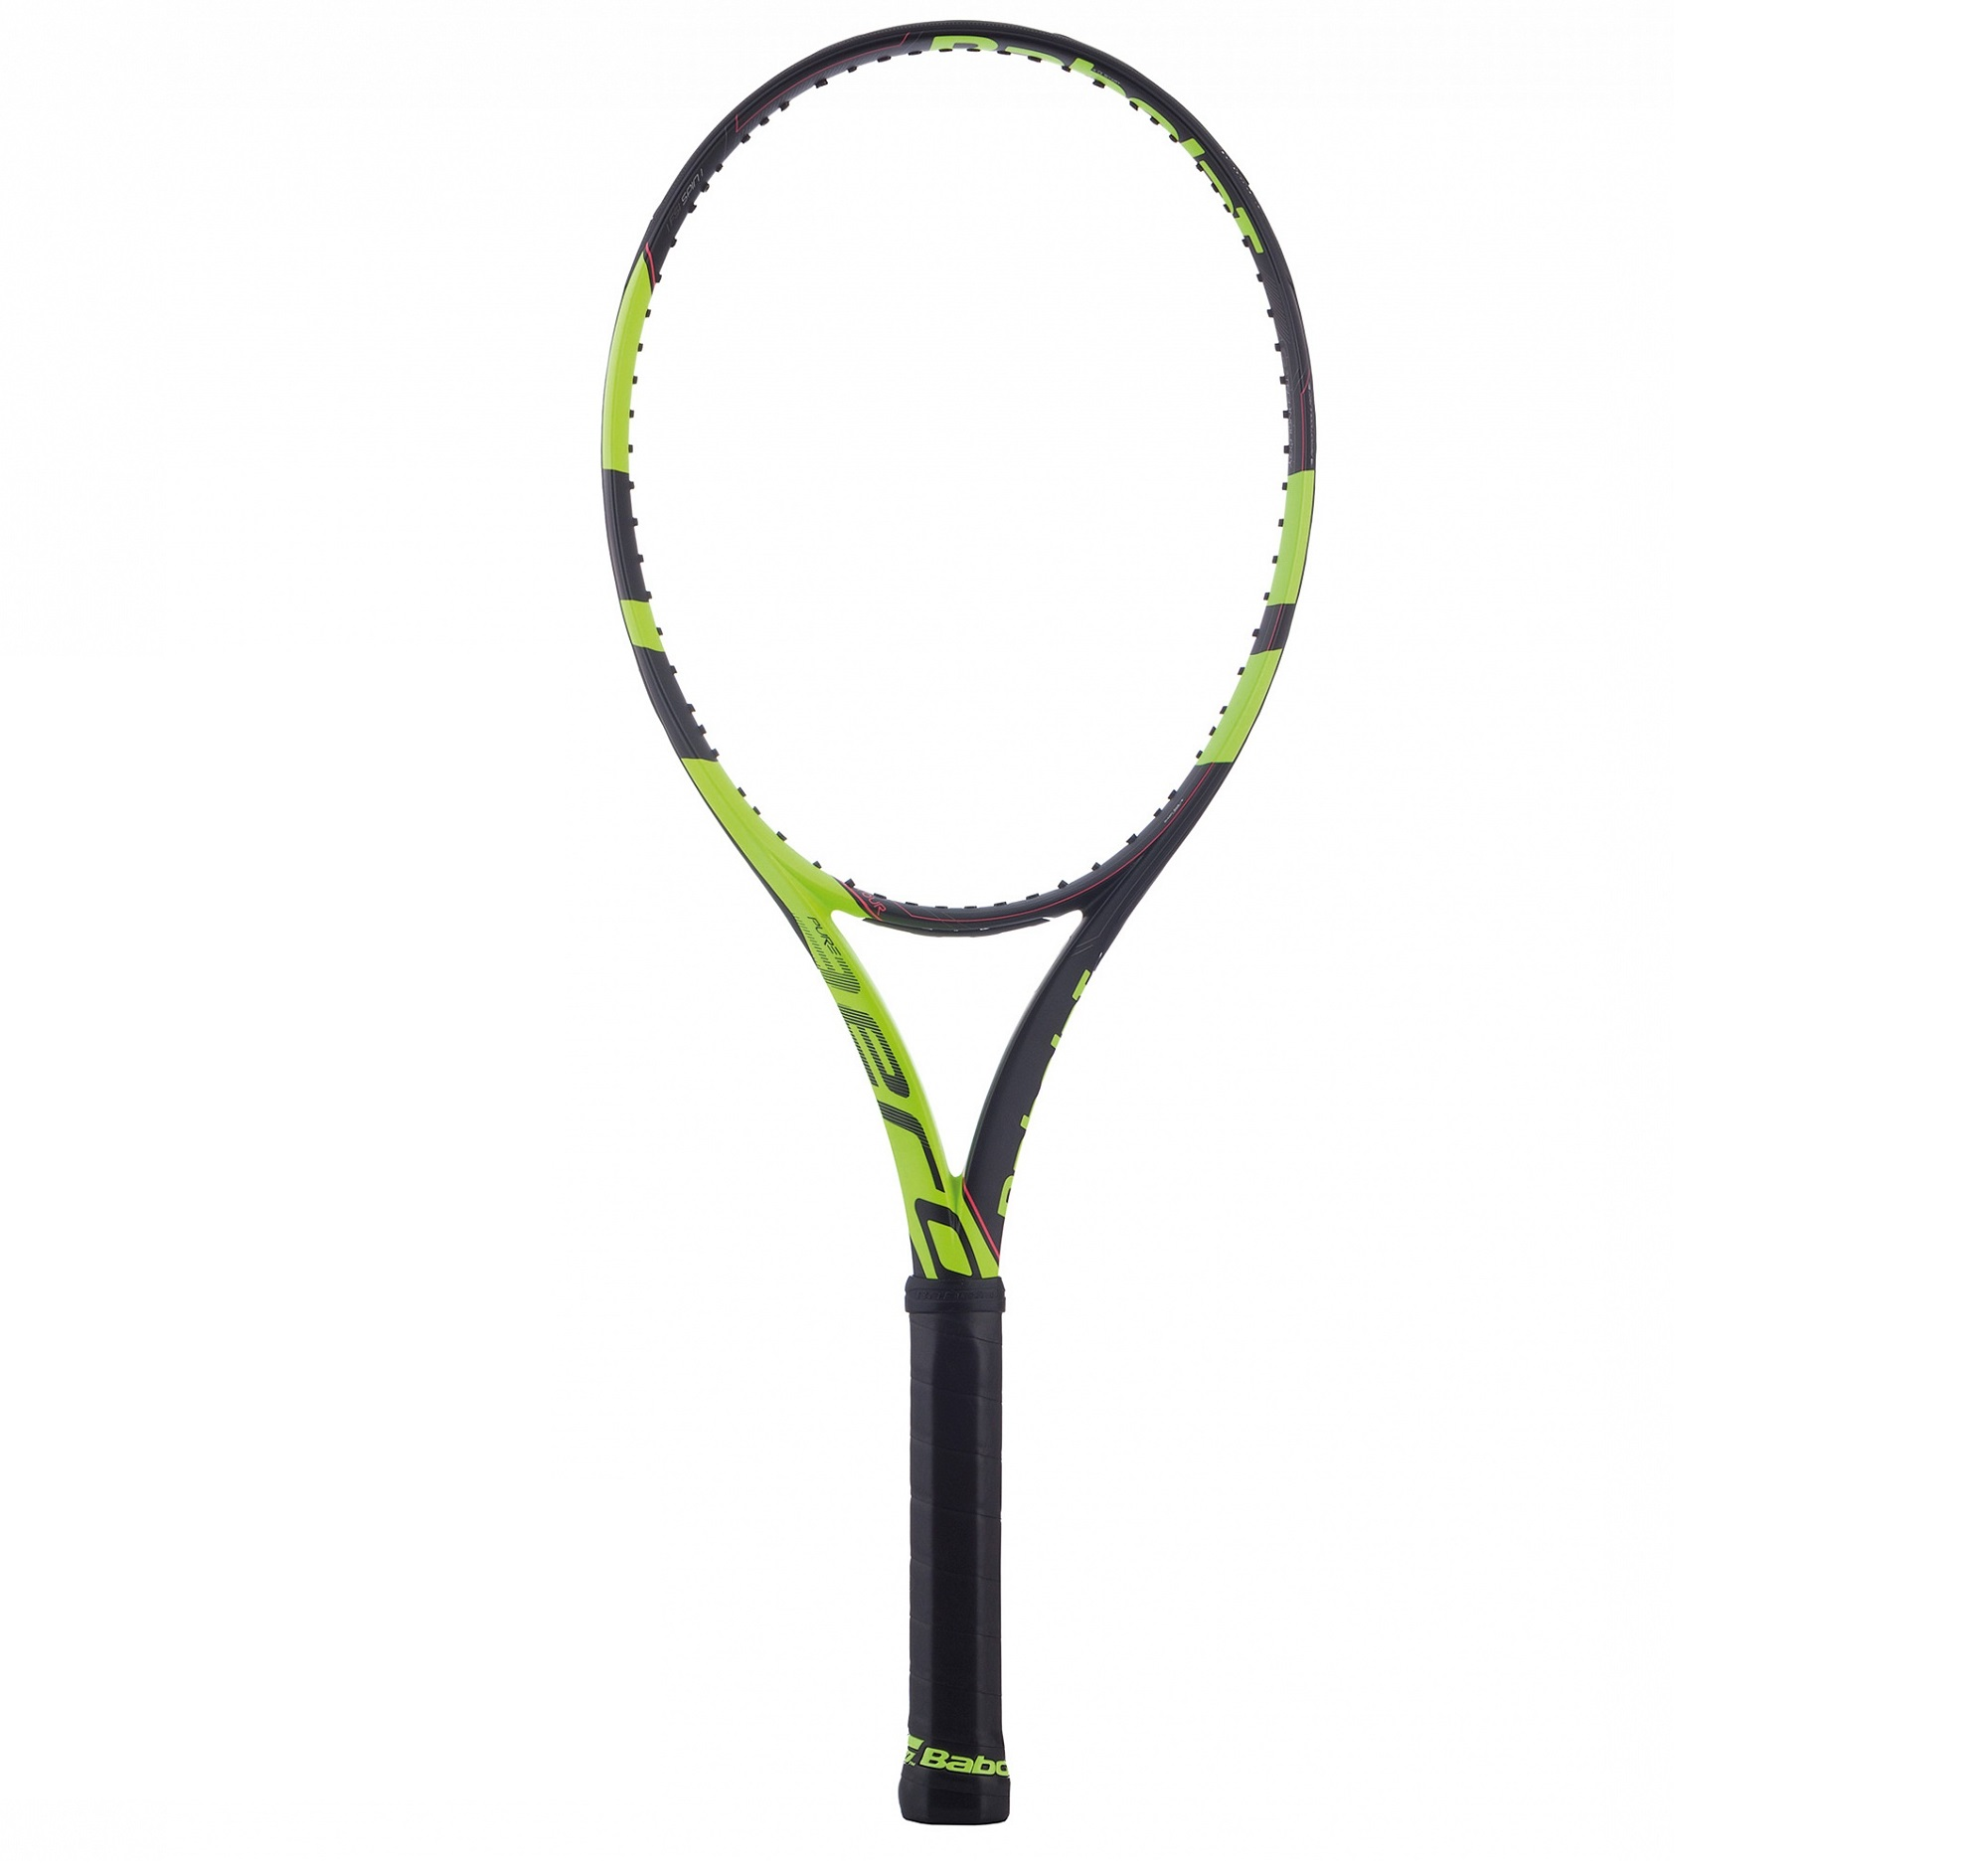 Babolat Ракетка для большого тенниса Babolat Pure Aero Tour stiga ракетка н т 2 tour